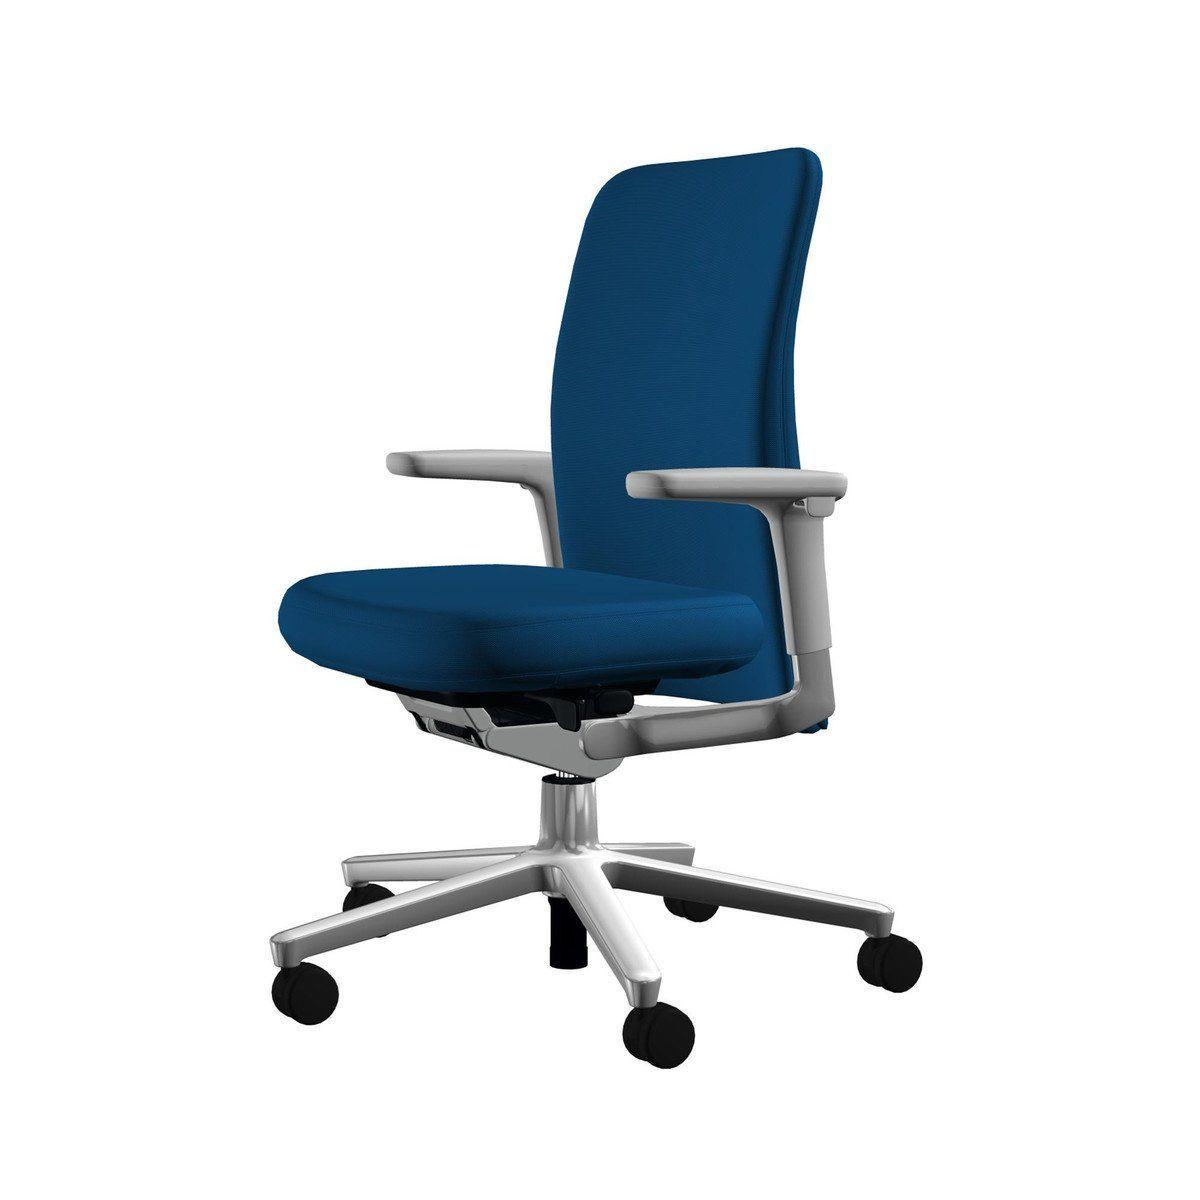 Bürostuhl Vitra pacific chair bürostuhl niedriger rücken vitra ambientedirect com